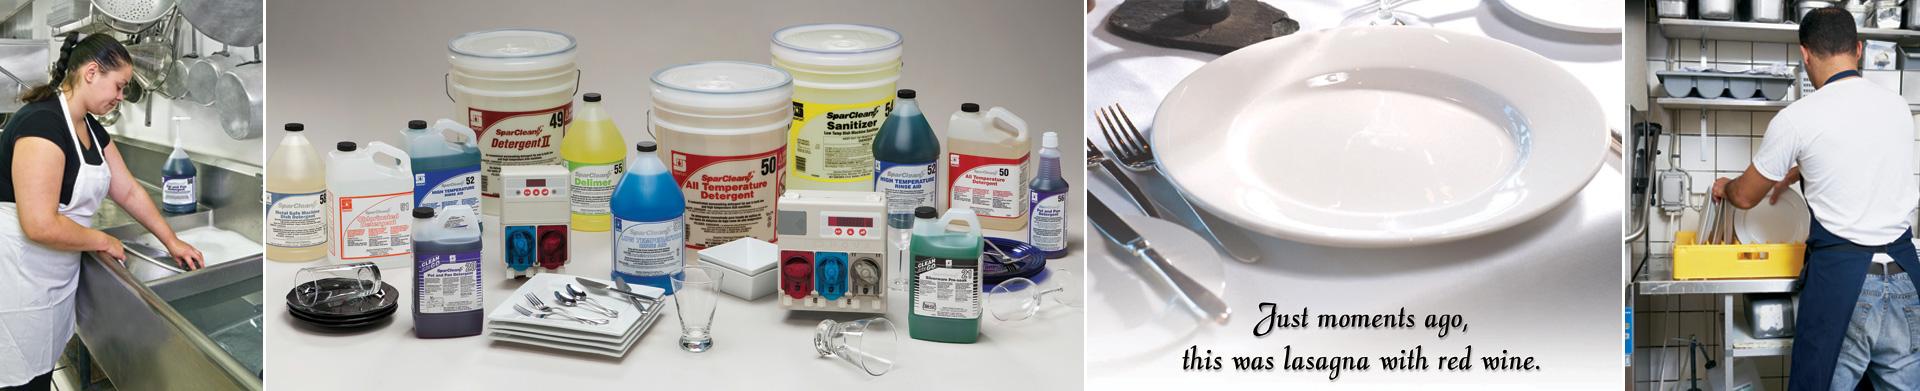 Dishwashing-Chemicals